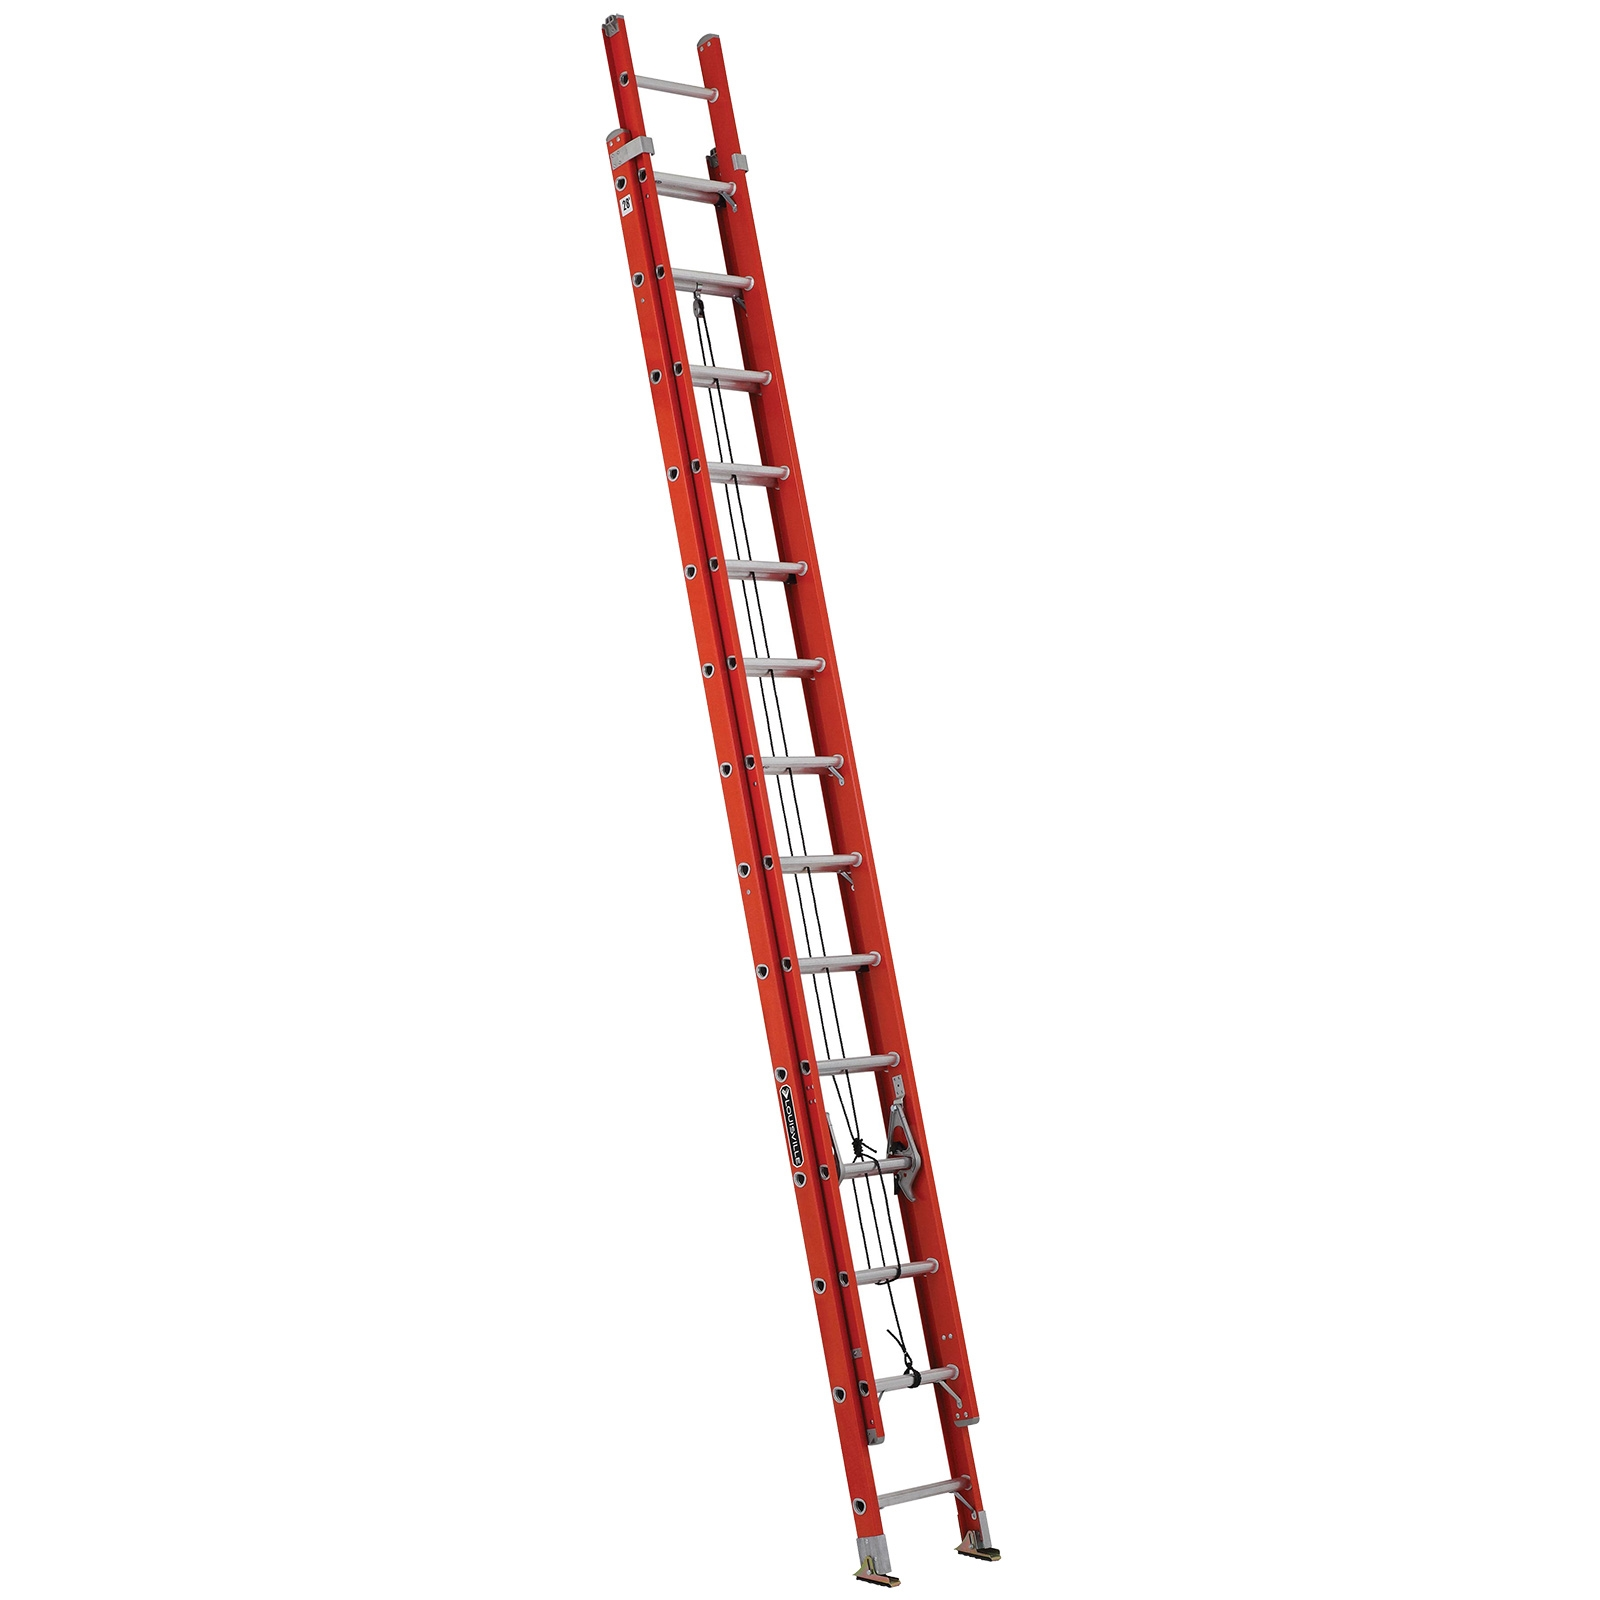 28 Ft Fiberglass Ladder W V Pole Grip Hooks